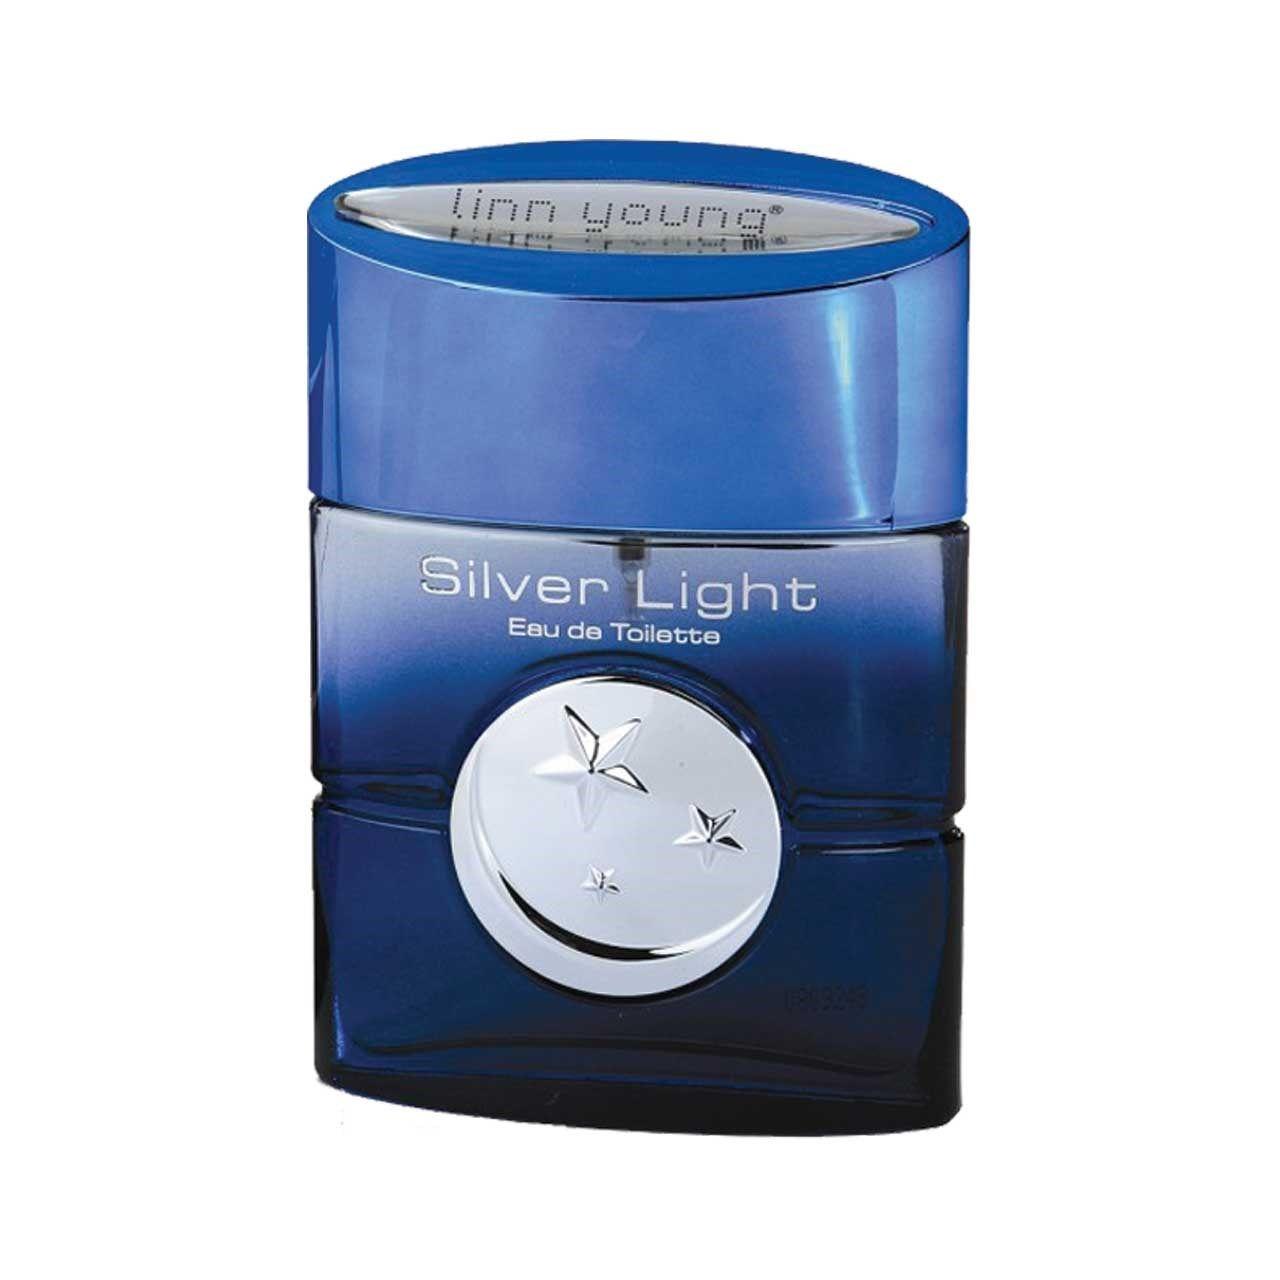 ادوتویلت مردانه لین یانگ مدل Silver Light حجم 100میلی لیتر -  - 1